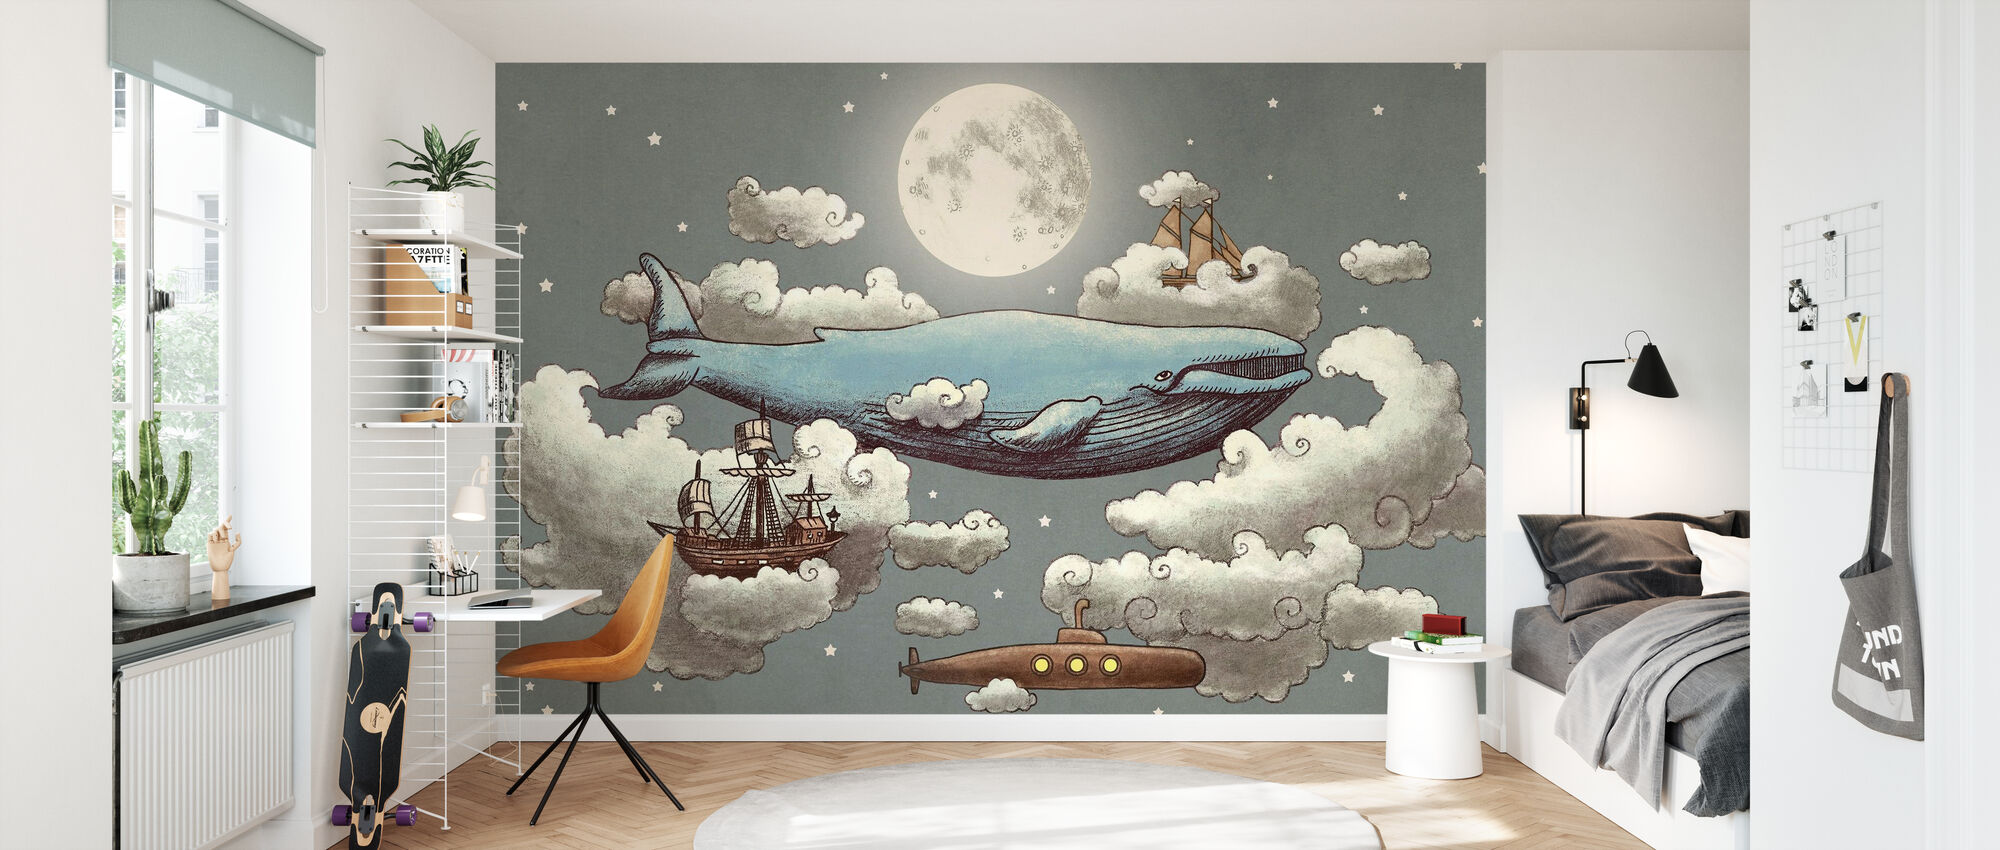 Ocean Meets Sky Original - Wallpaper - Kids Room